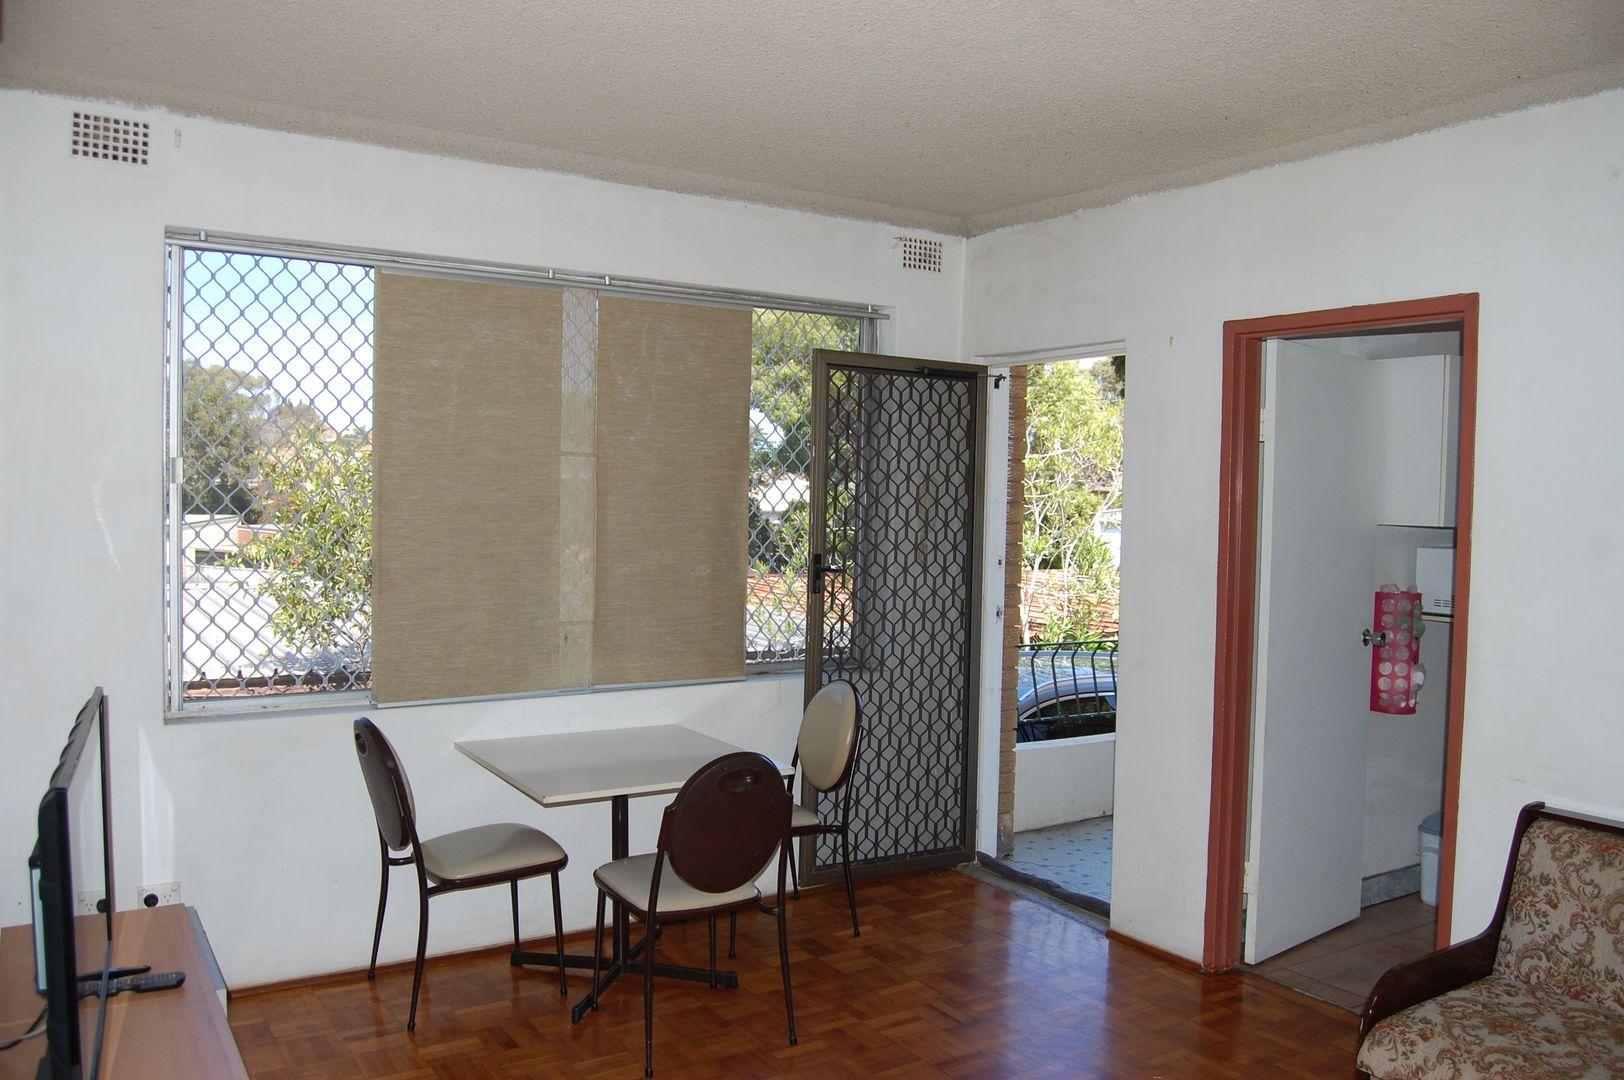 7/56 Crinan Street, Hurlstone Park NSW 2193, Image 1